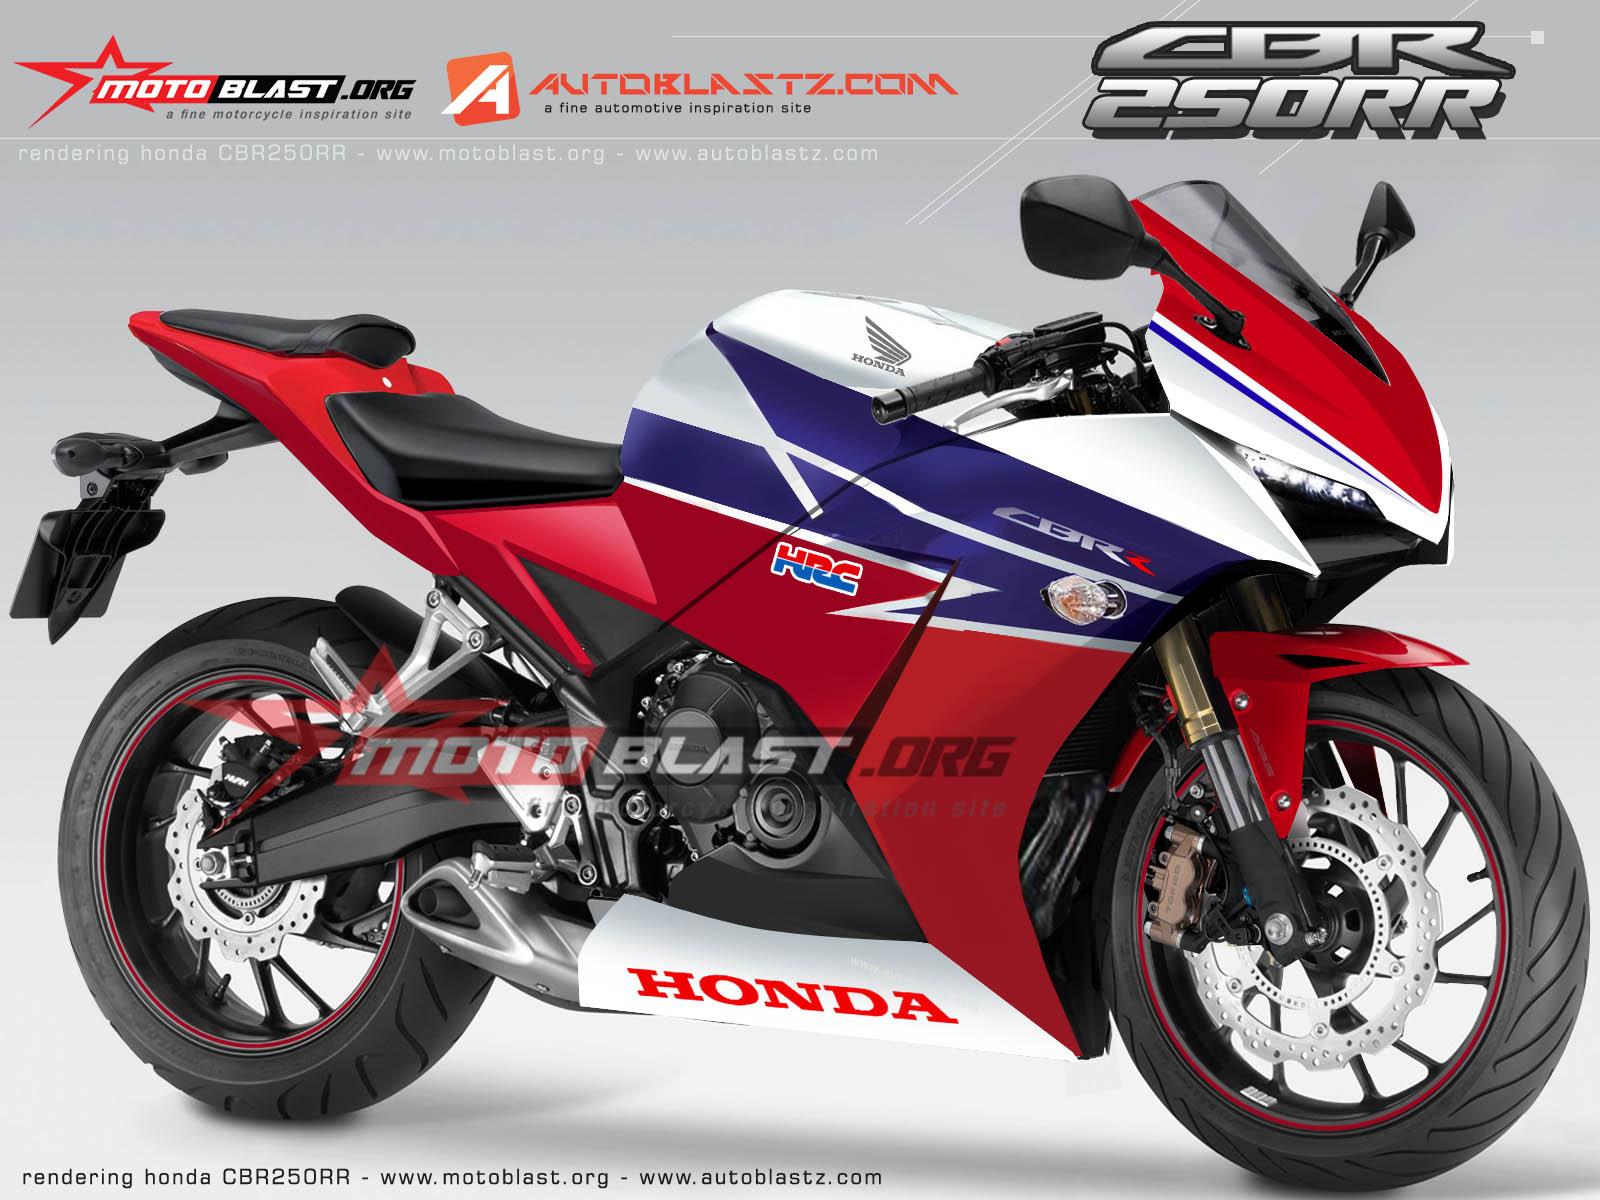 Suzuki Inazuma 250 2014 likewise Modifikasi Motor Revo Absolute in ...